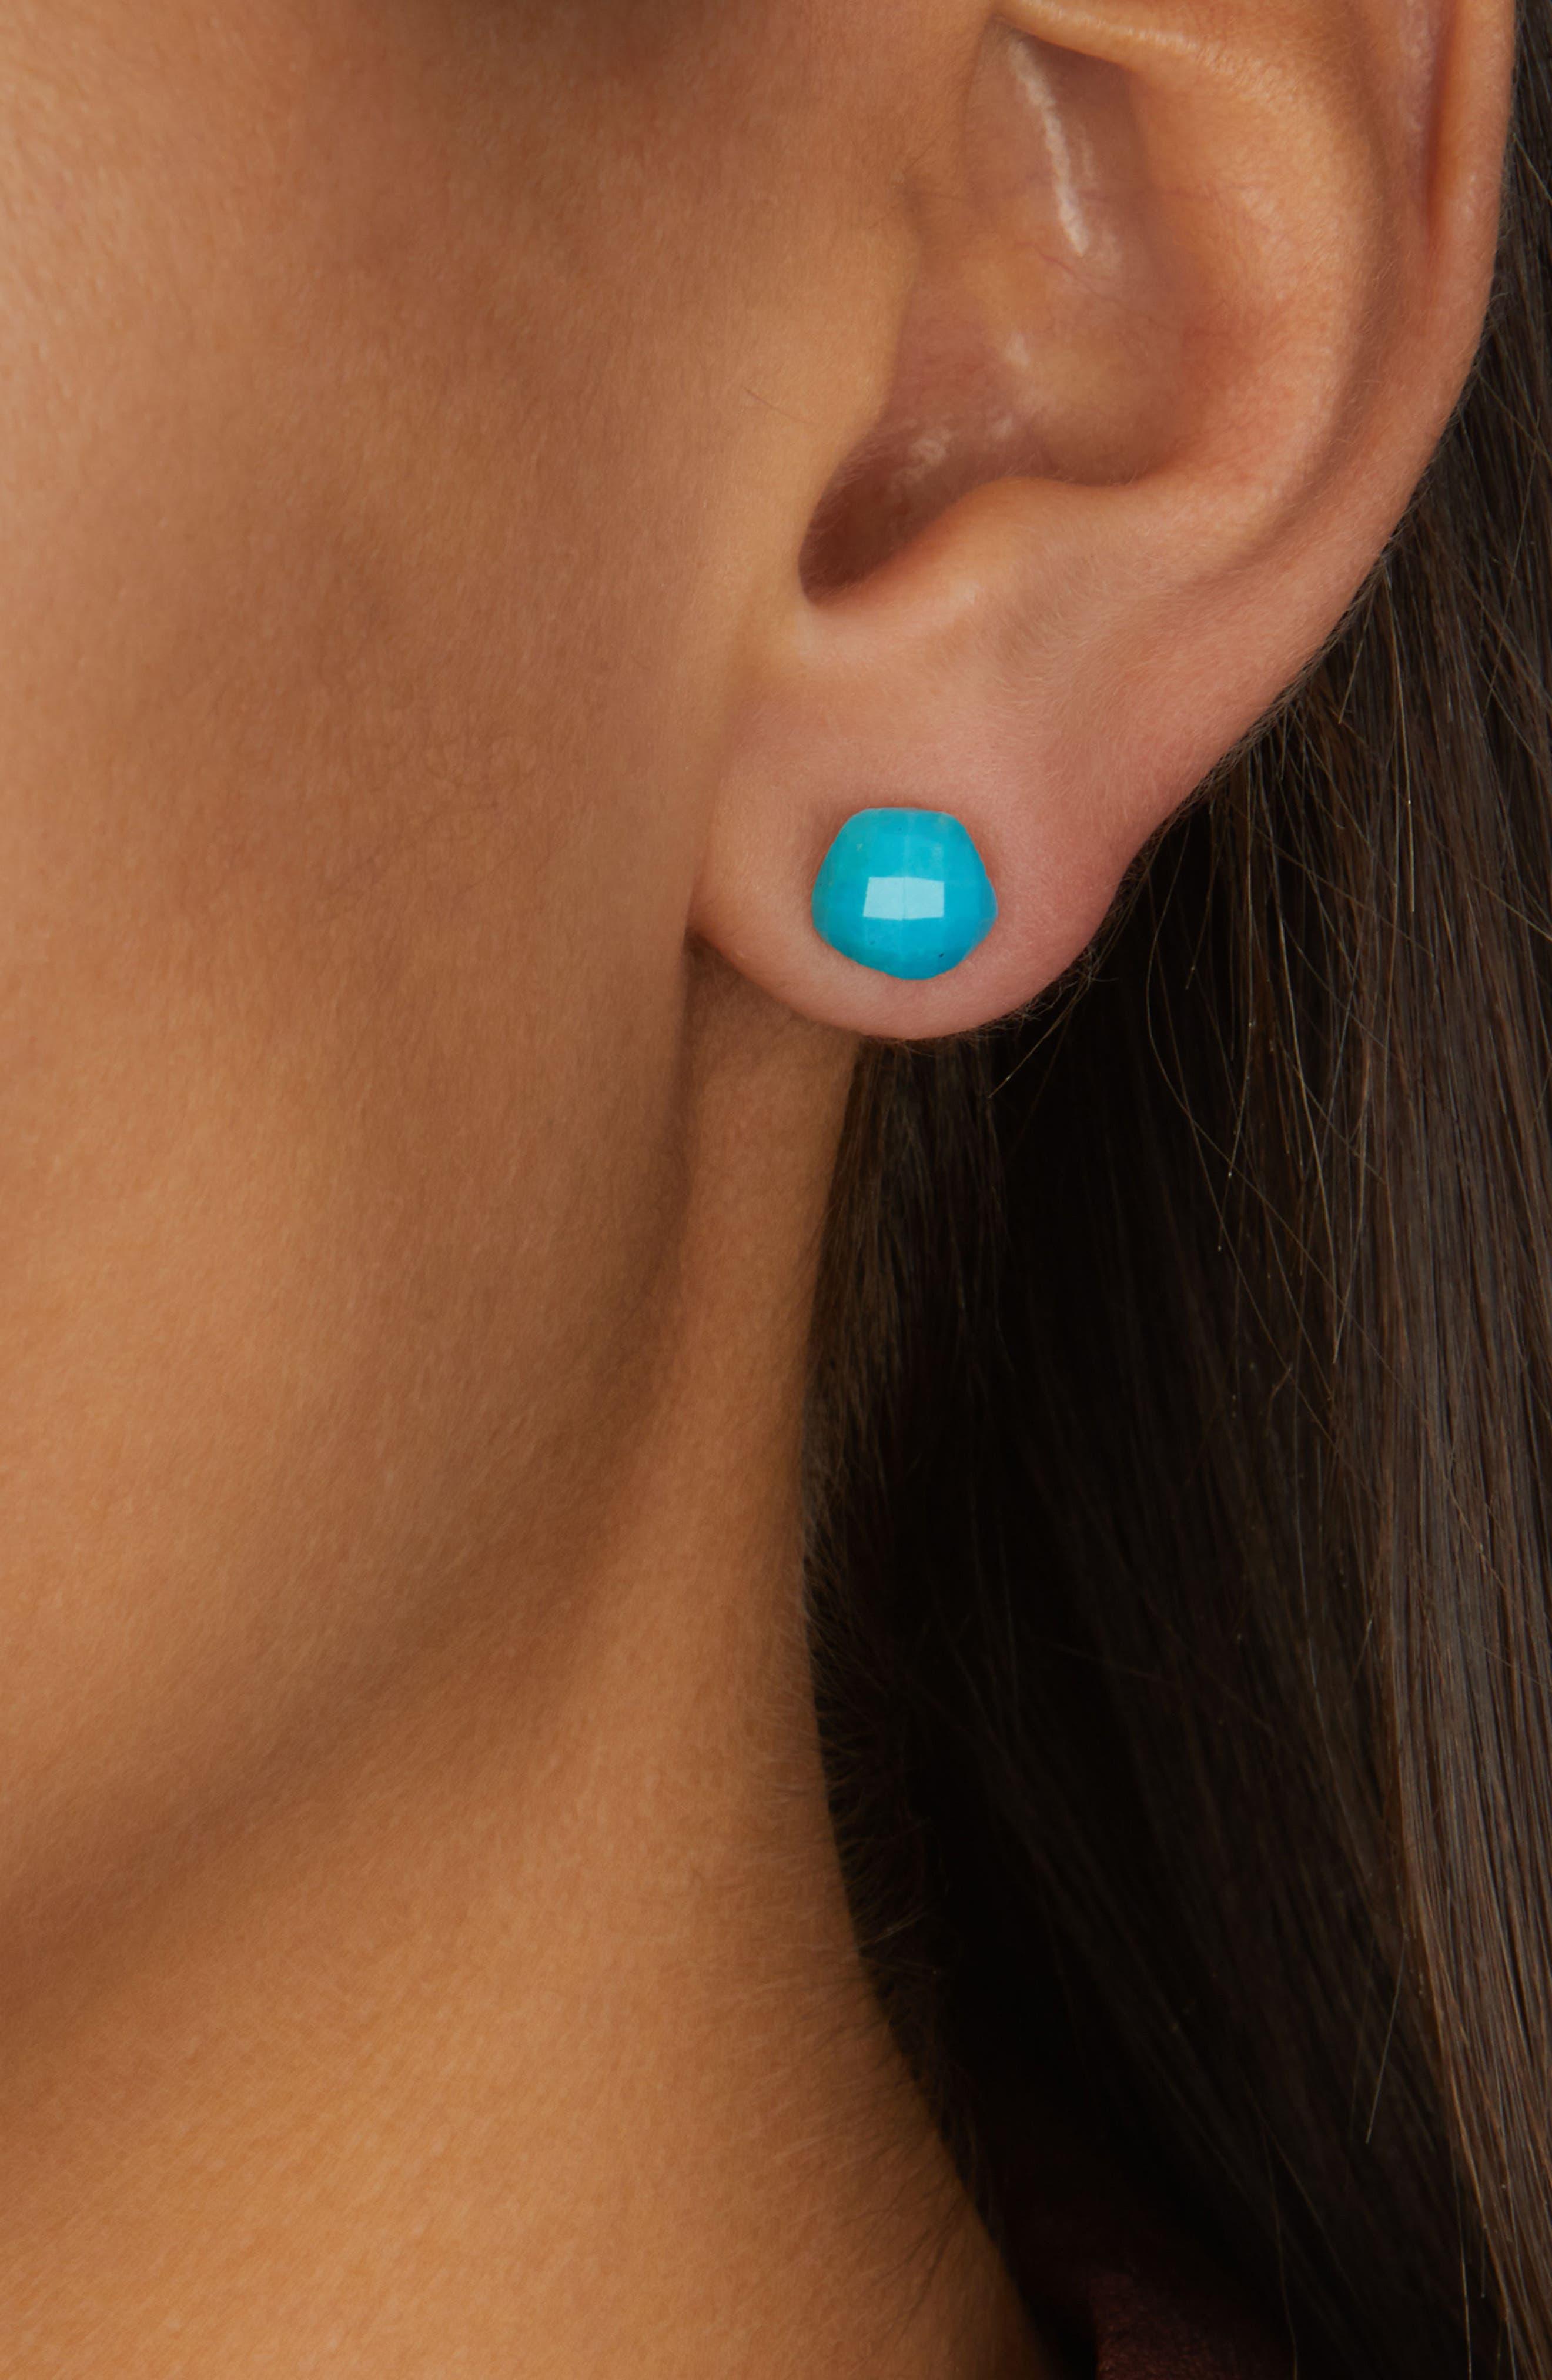 Nura Nugget Stud Earrings,                             Alternate thumbnail 2, color,                             TURQUOISE